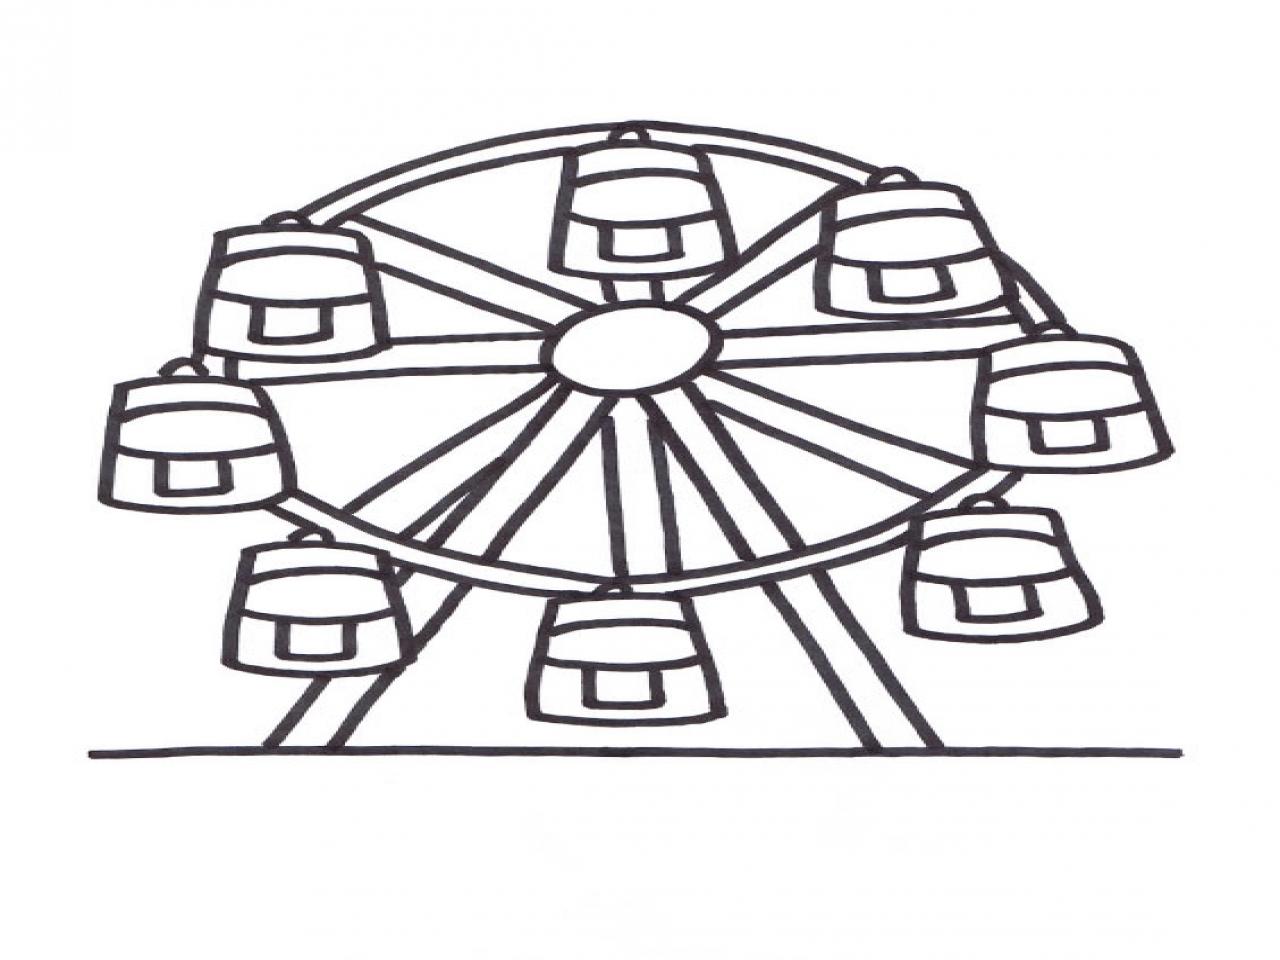 Ferris Wheel Coloring Stock Illustrations – 11 Ferris Wheel Coloring Stock  Illustrations, Vectors & Clipart - Dreamstime   960x1280